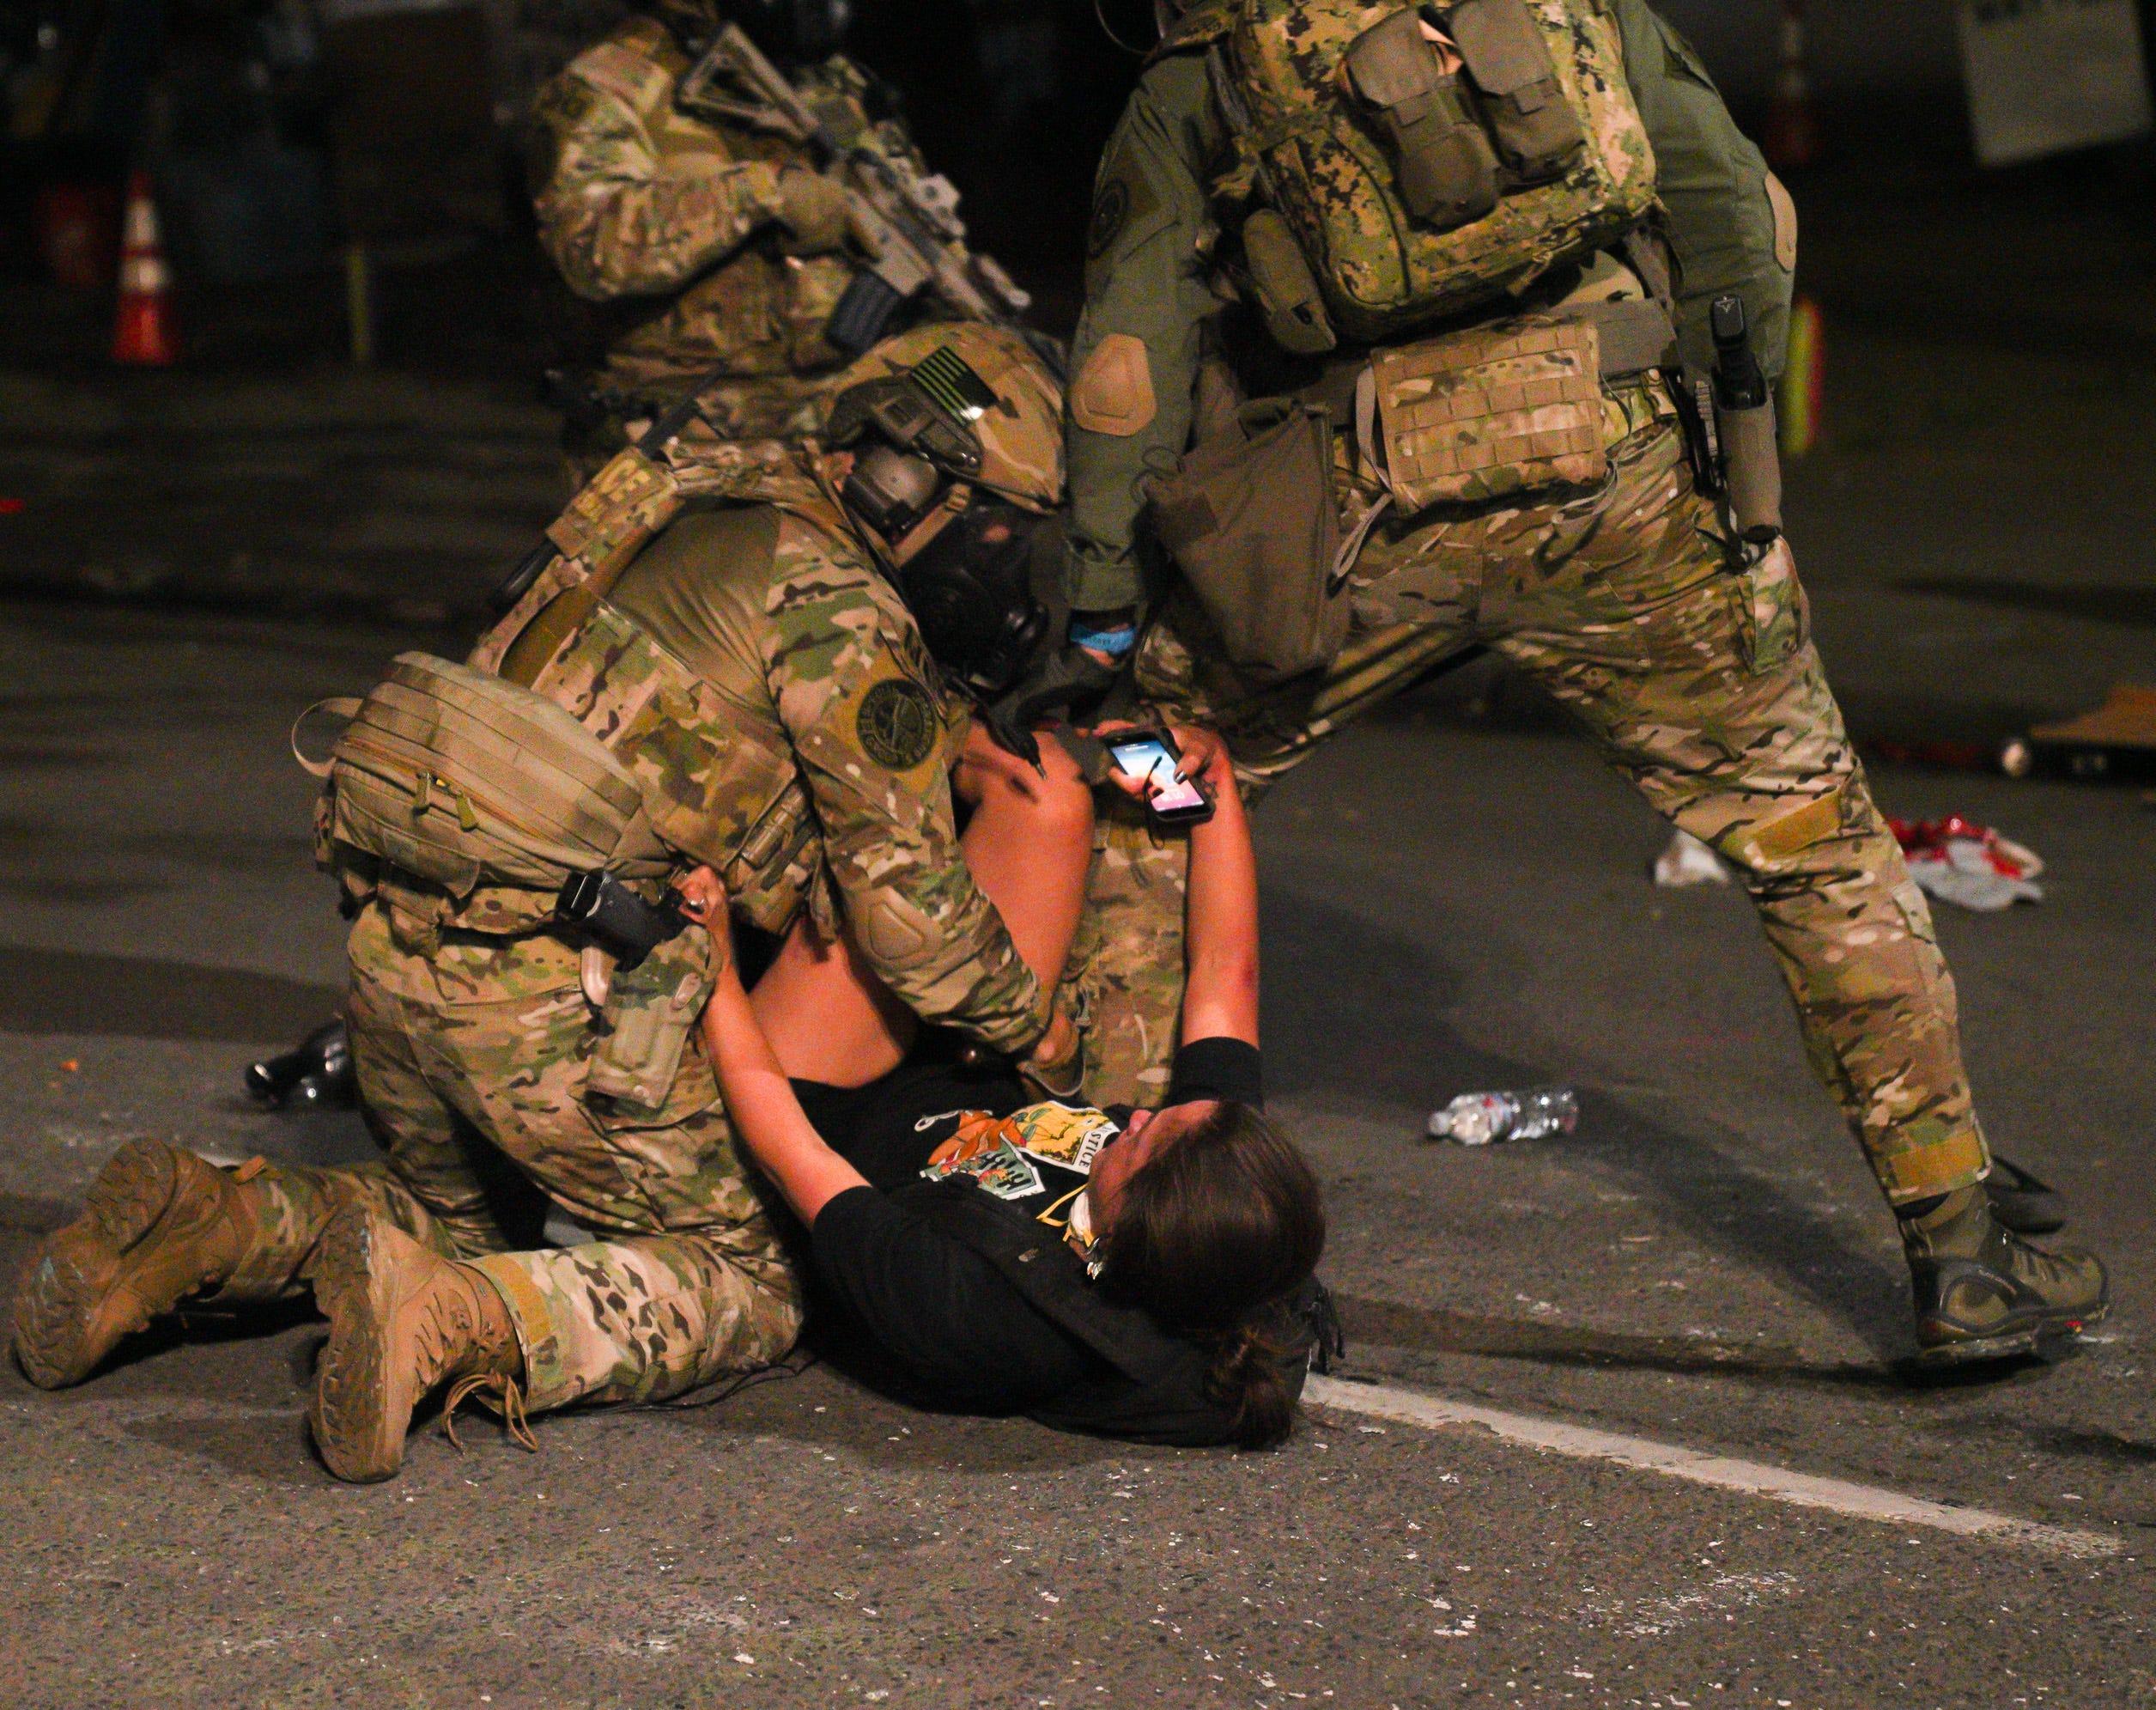 federal troops in US streets